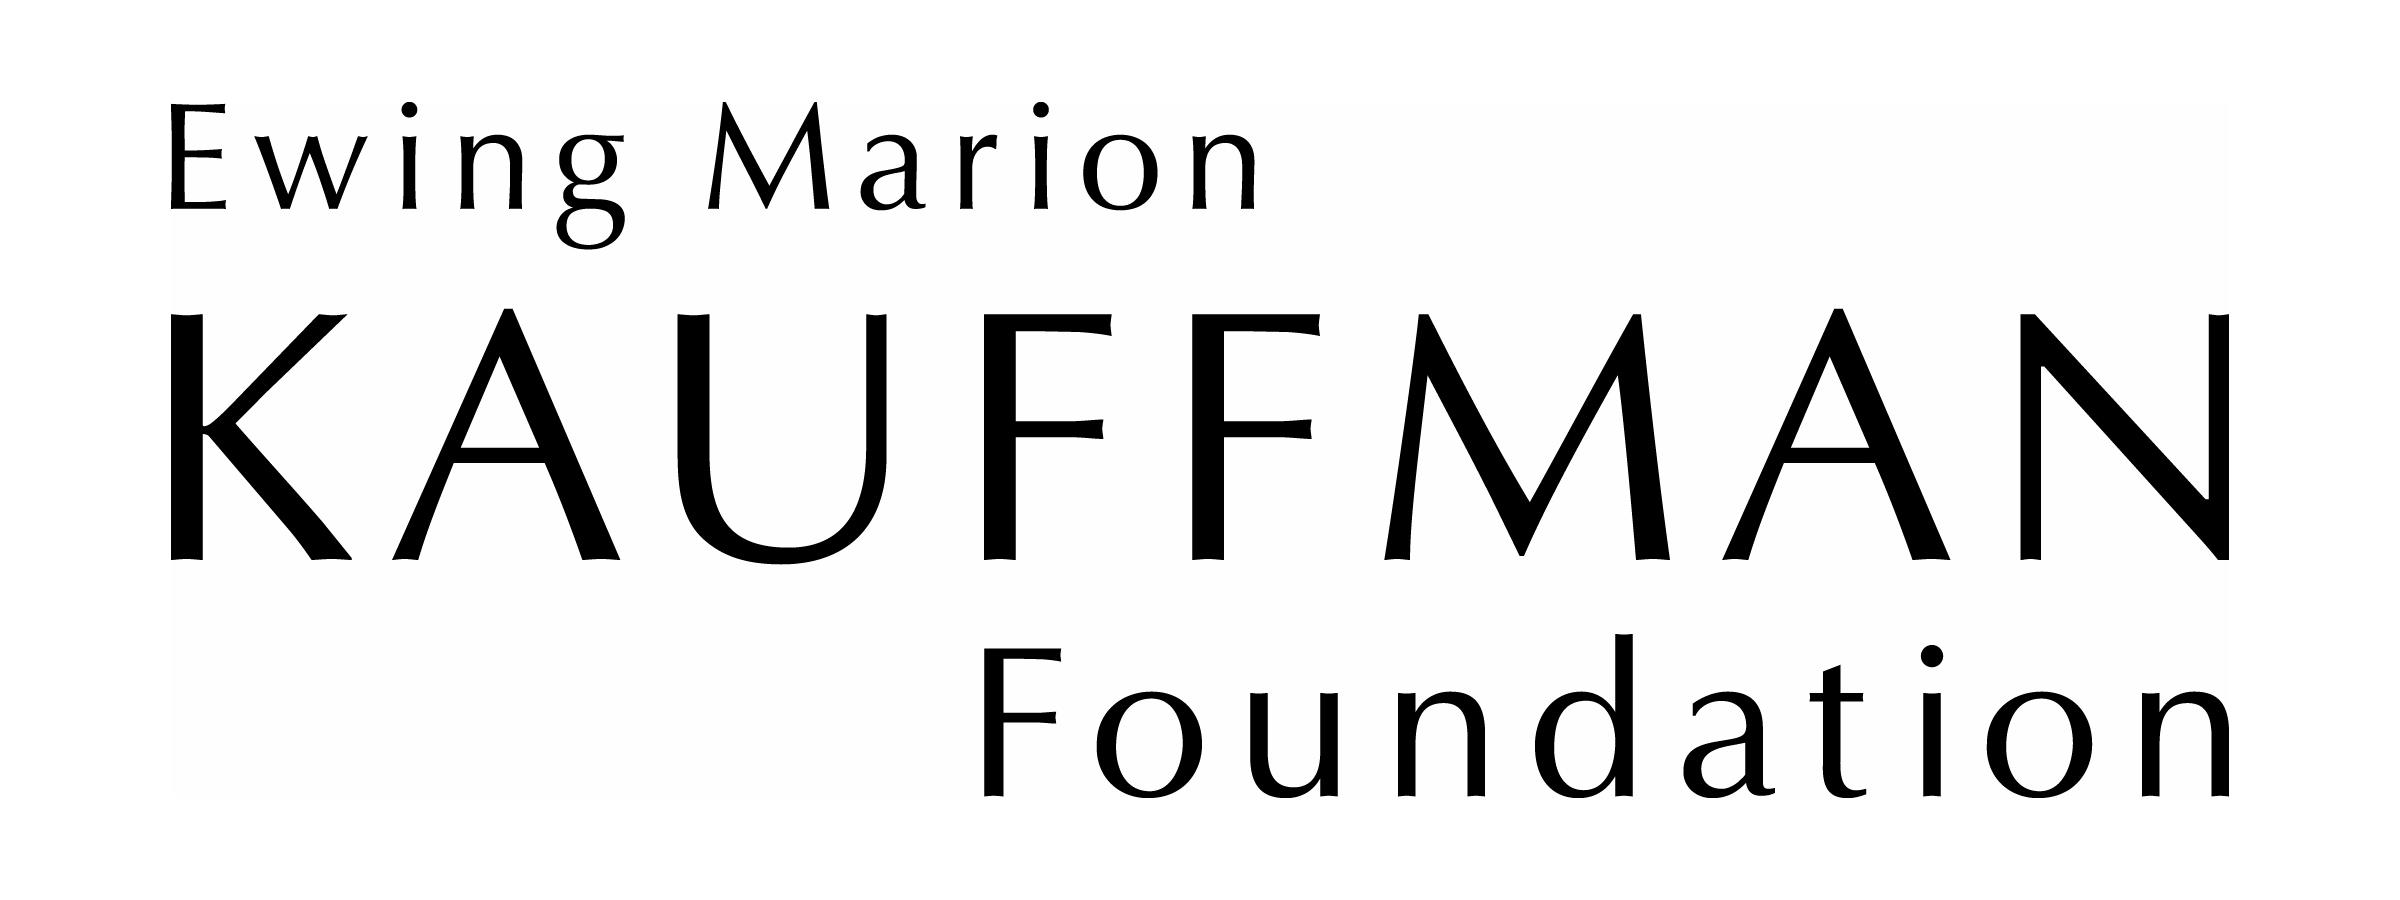 Kauffman_foundation_logo